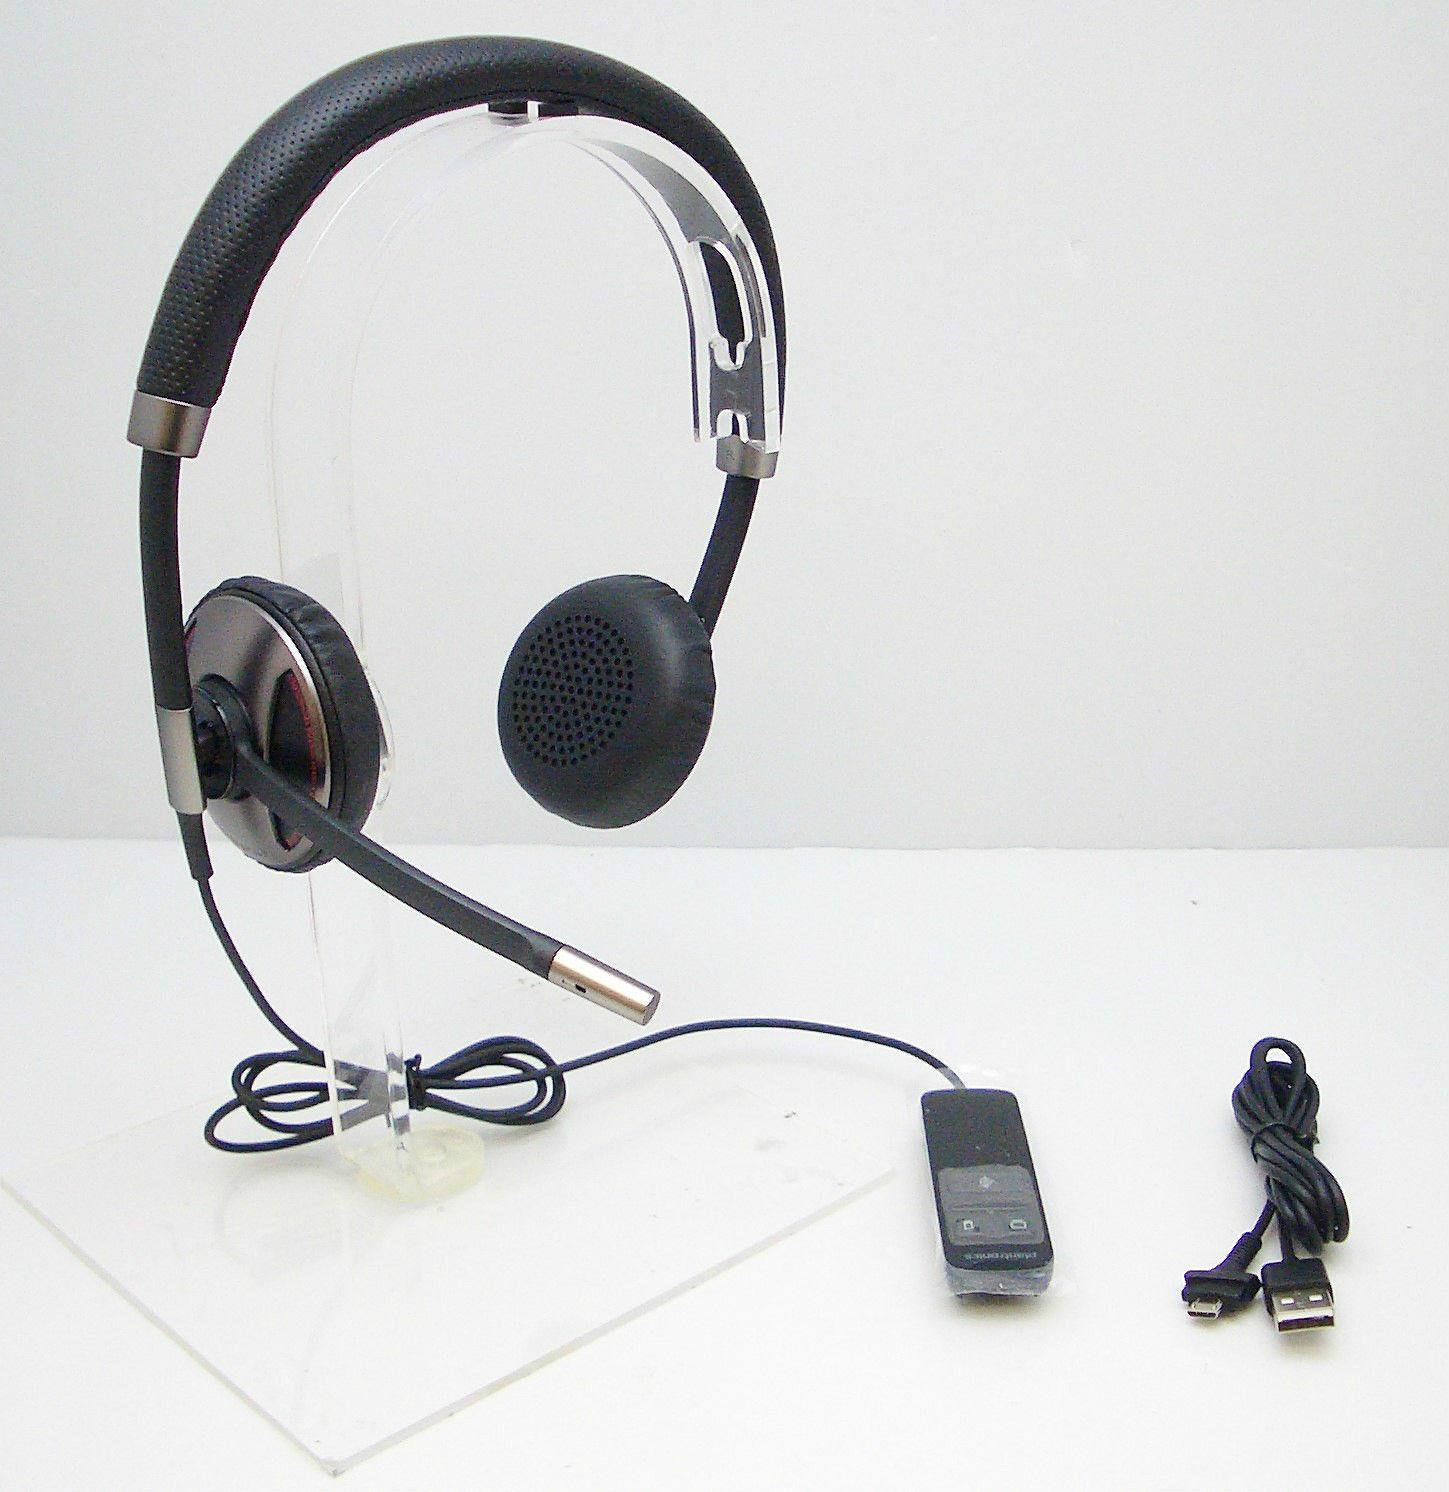 plantronics blackwire c720 bluetooth usb over the head binaural stereo headset. Black Bedroom Furniture Sets. Home Design Ideas